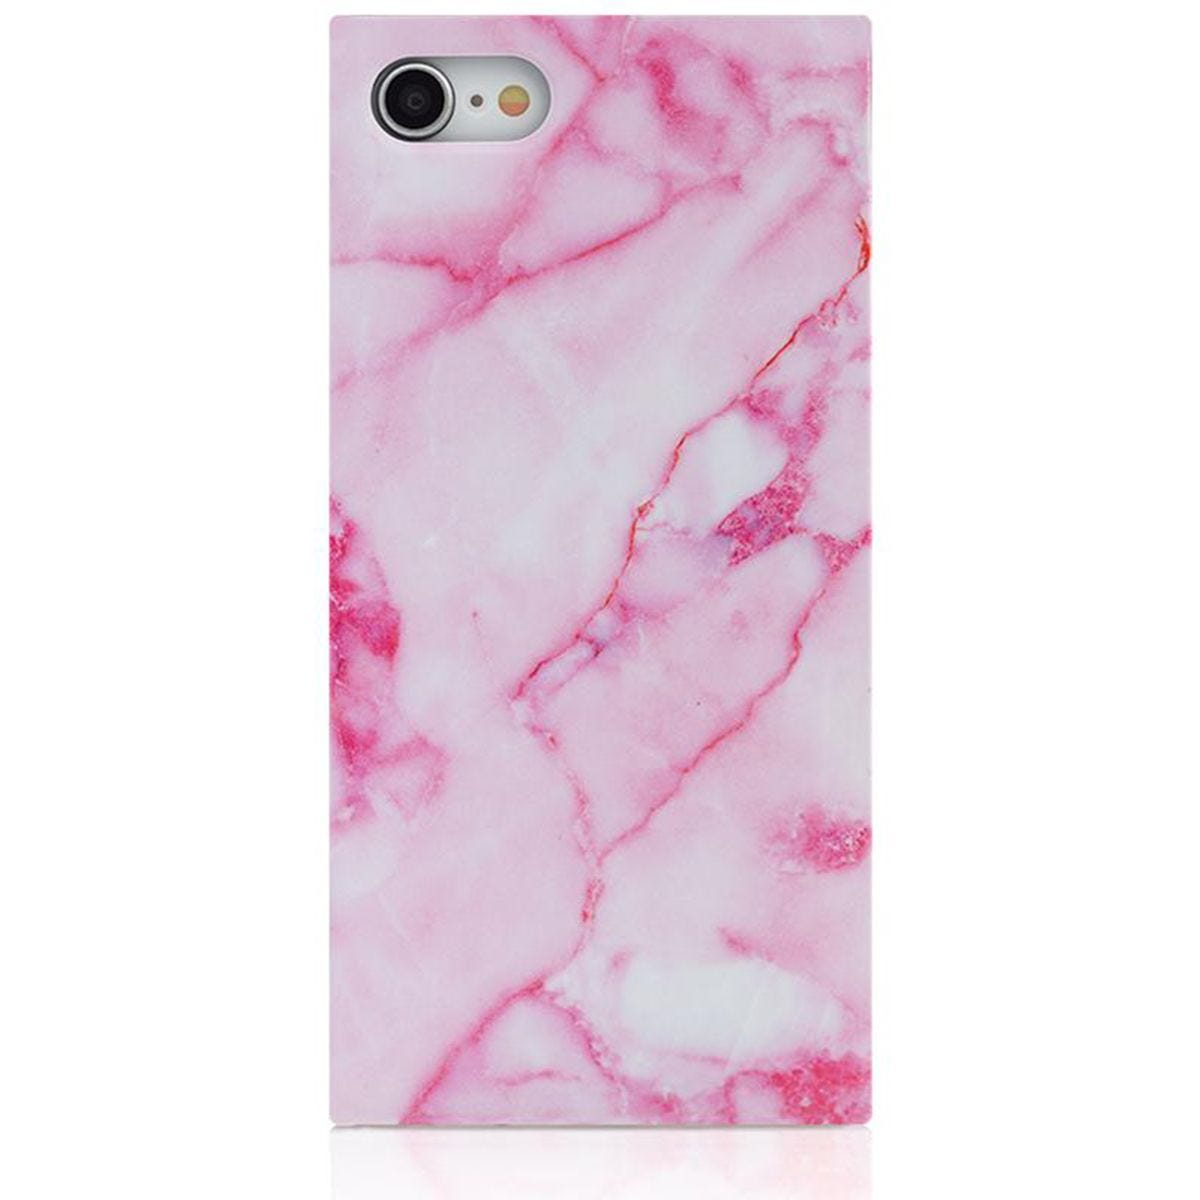 iDecoz Blush Marble Phone Case iPhone XR